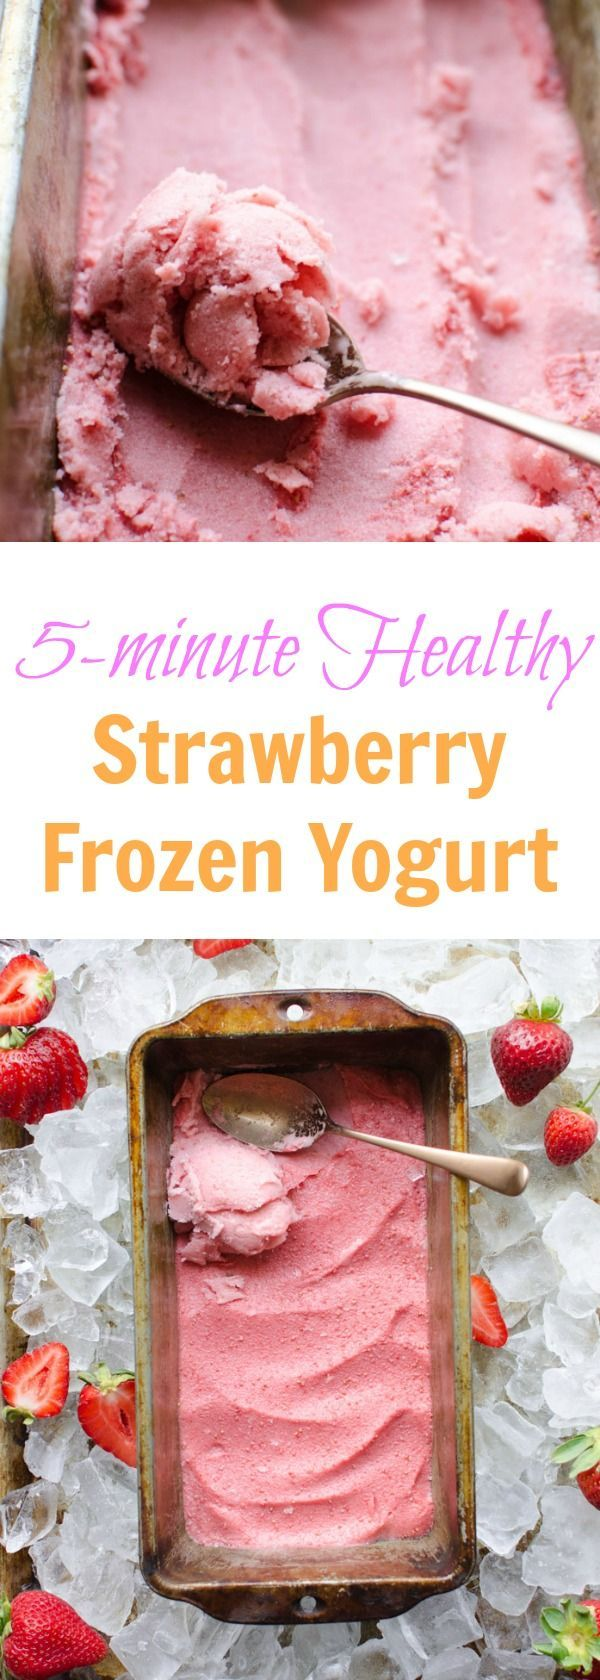 ... yogurt frozen blueberries strawberry frozen yogurt packing lunch